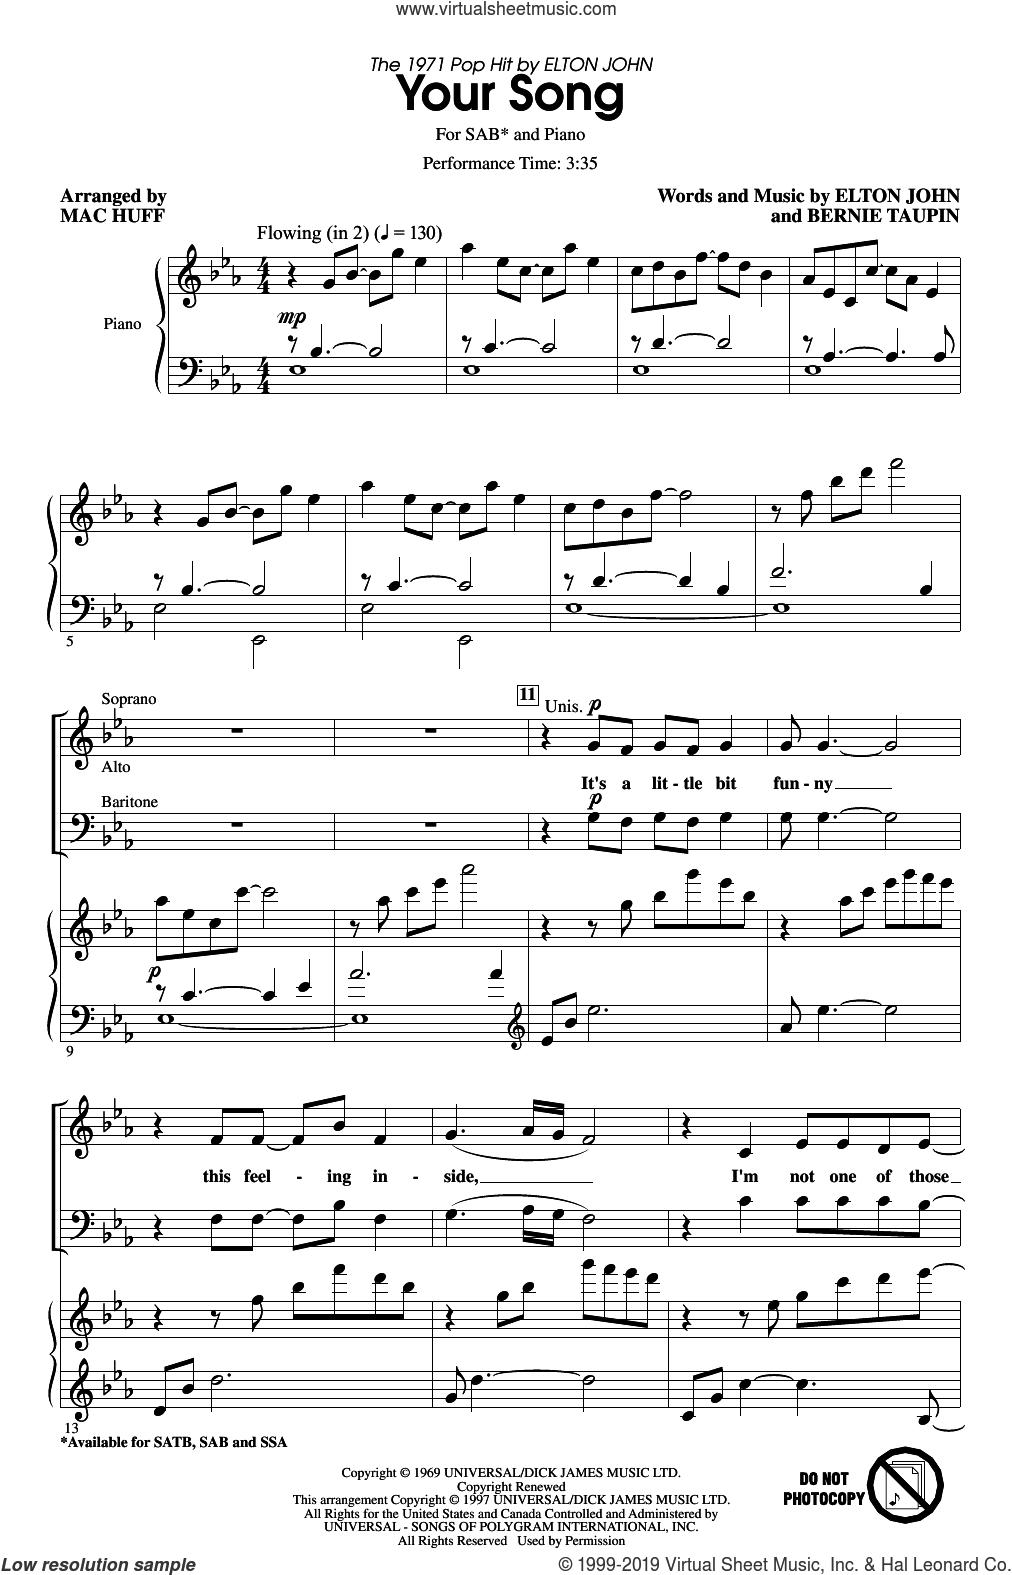 Your Song (arr. Mac Huff) sheet music for choir (SAB: soprano, alto, bass) by Elton John, Mac Huff, Rod Stewart, Elton John and Bernie Taupin and Bernie Taupin, intermediate skill level